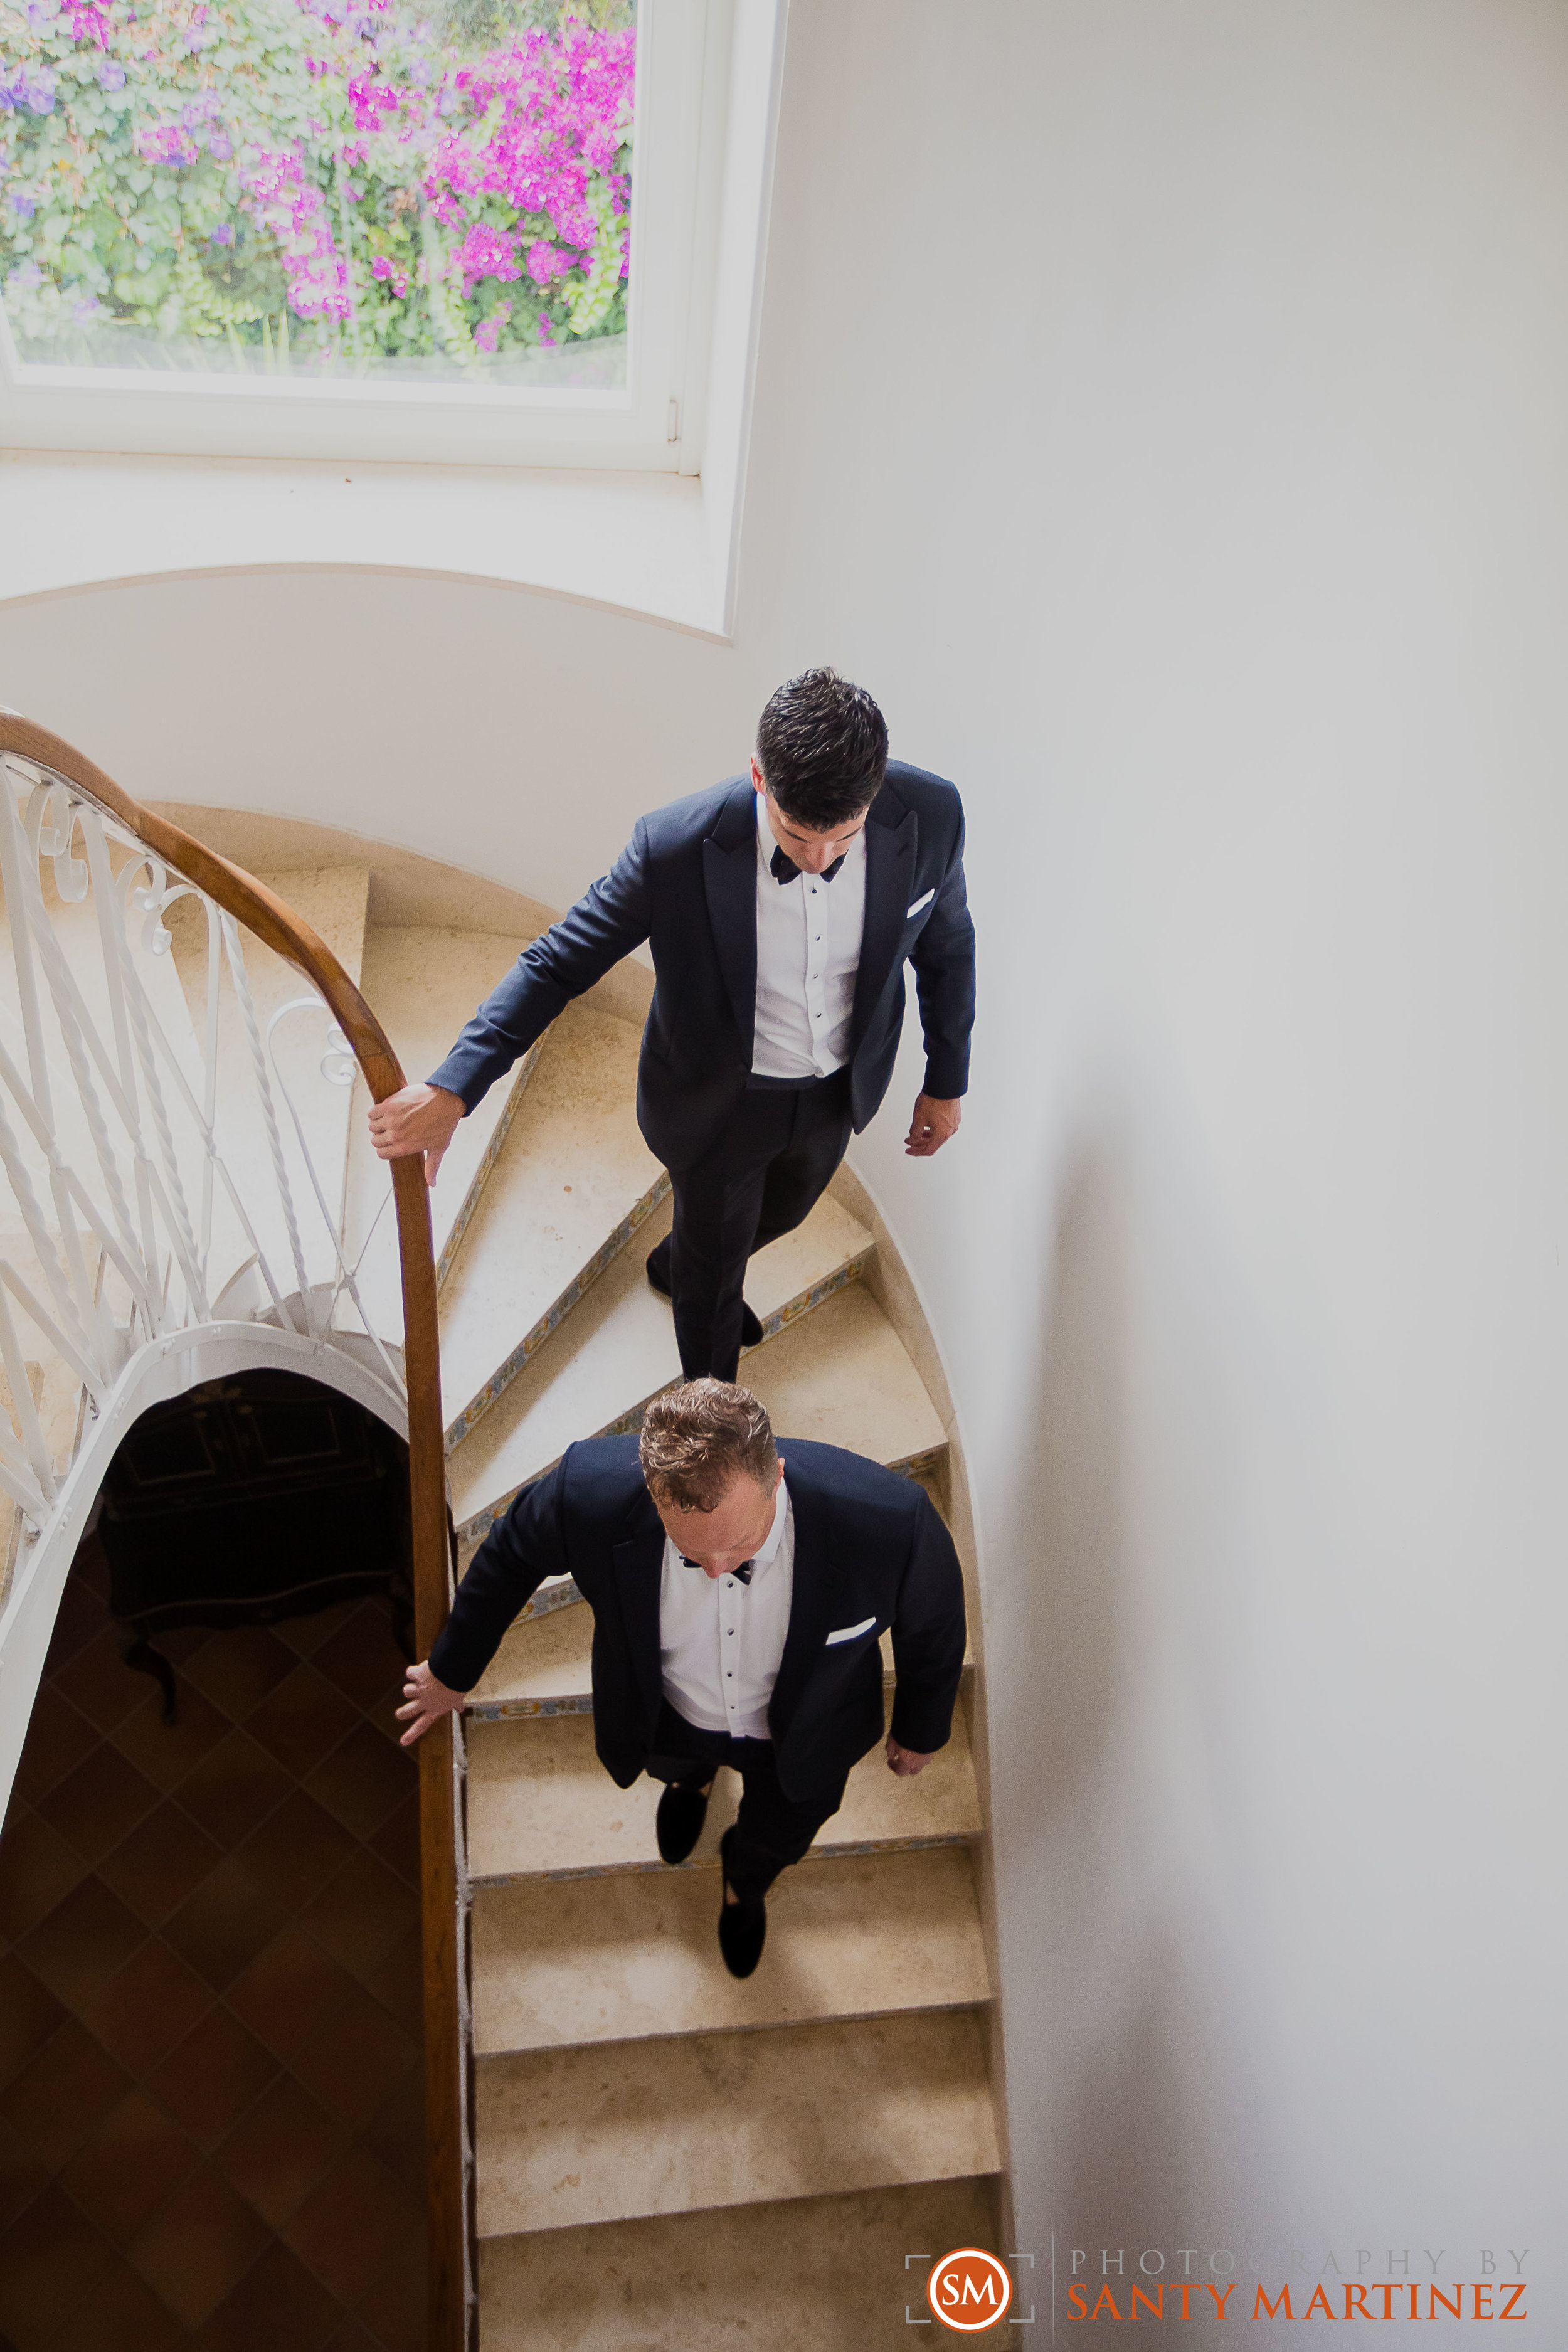 Wedding Capri Italy - Photography by Santy Martinez-10.jpg